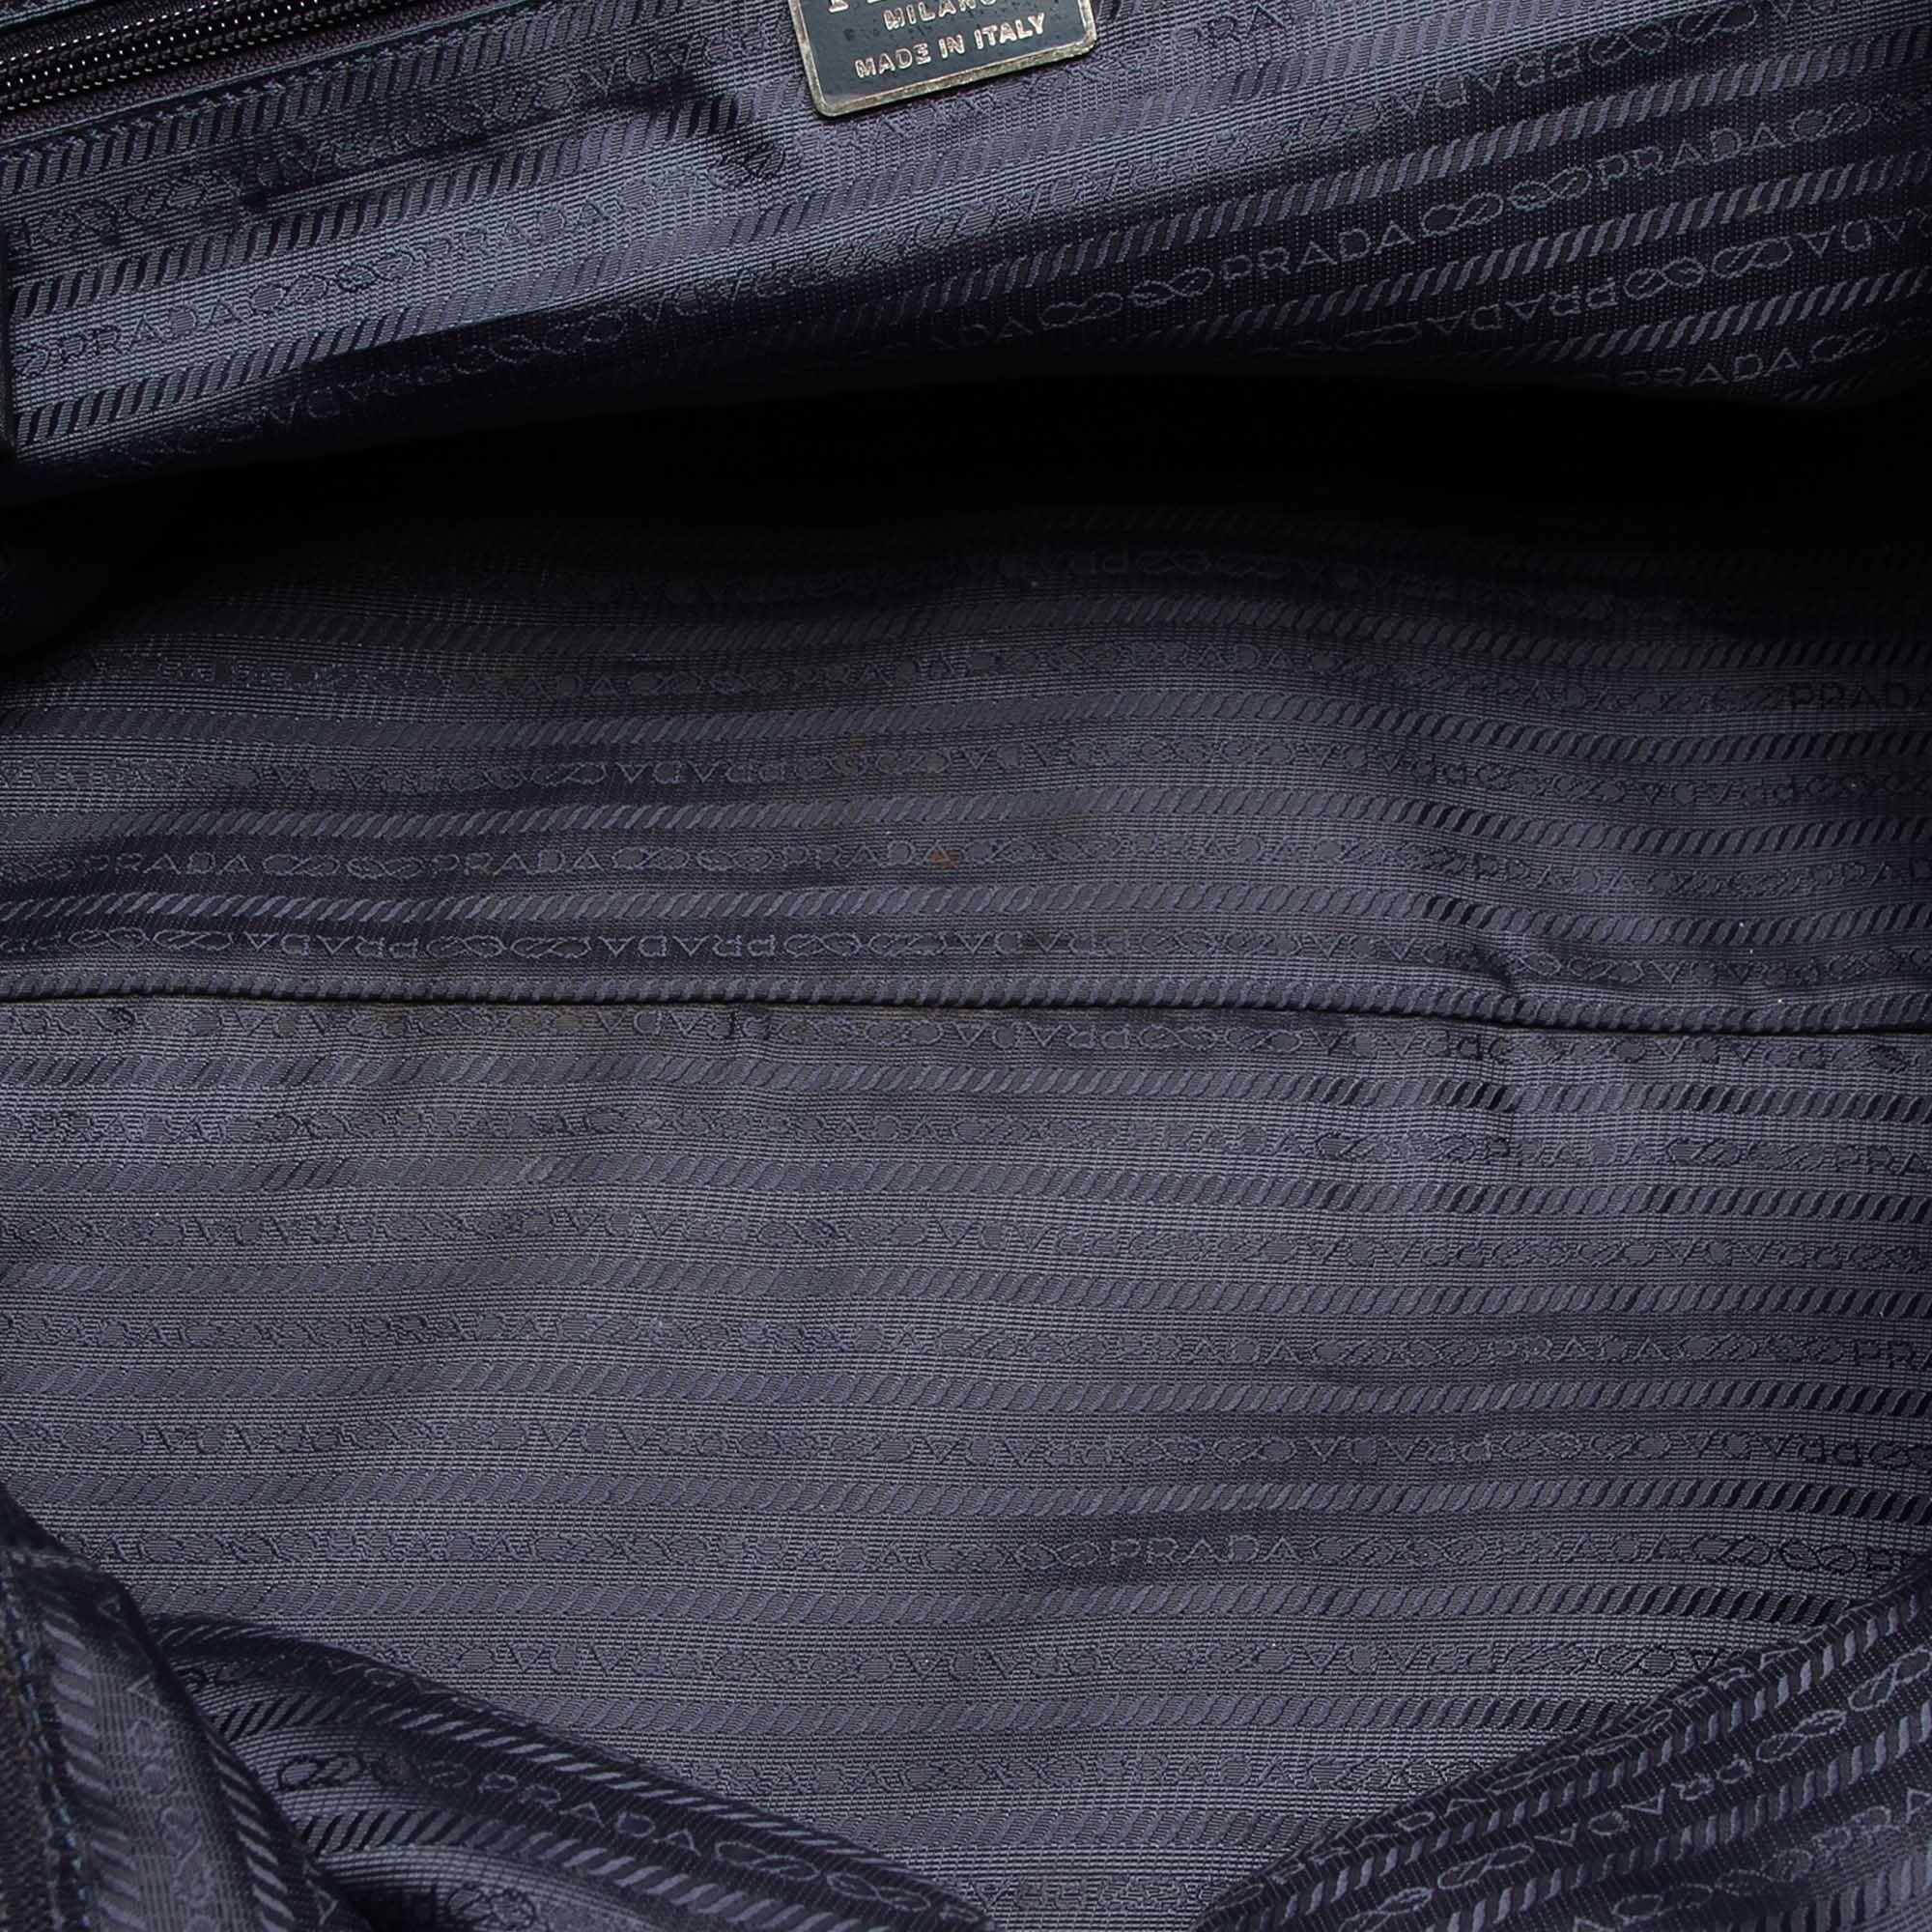 Vintage Prada Tessuto Travel Bag Blue